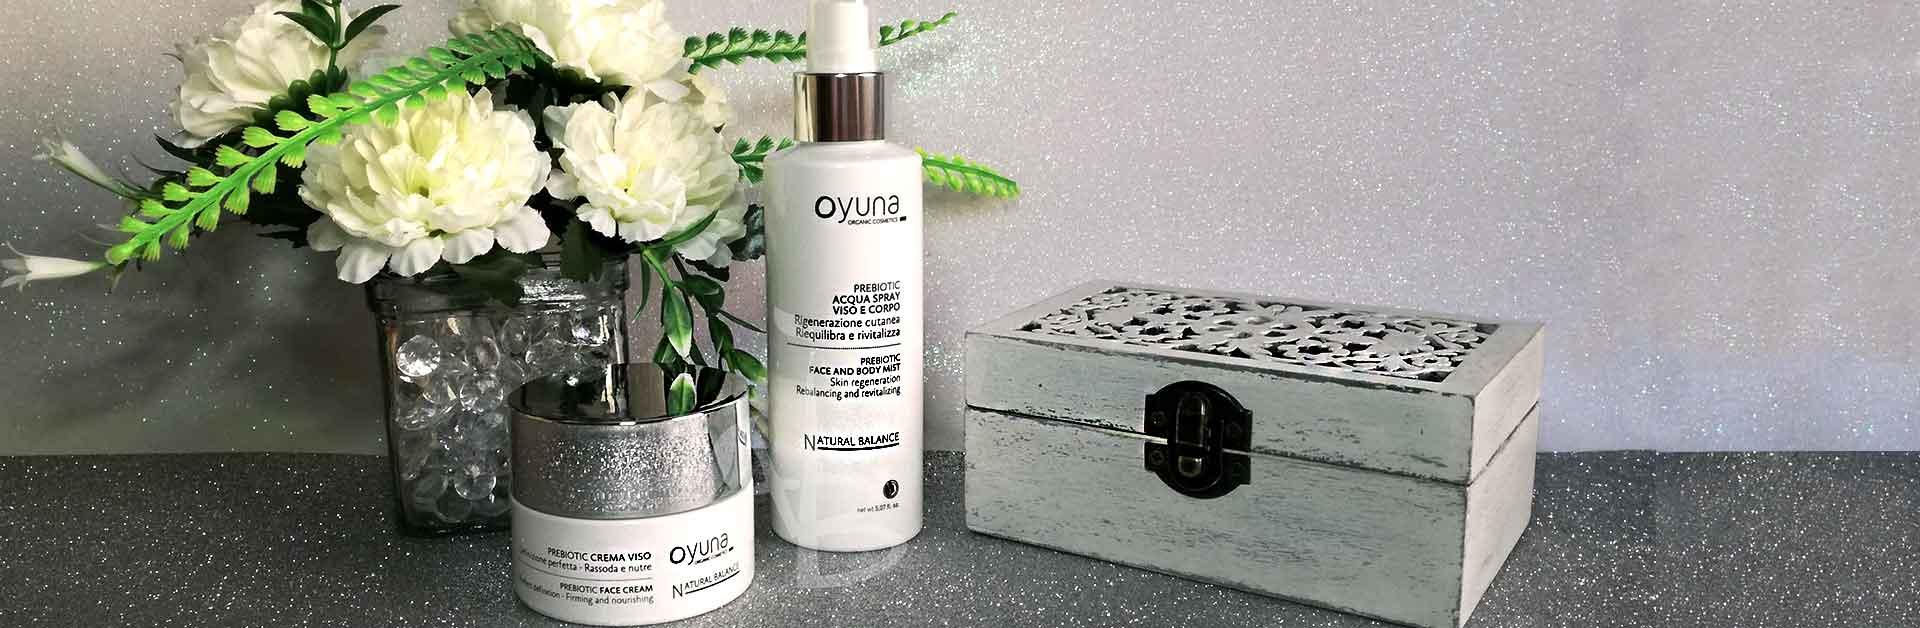 Linea natural balance crema viso e acqua spray di Oyuna